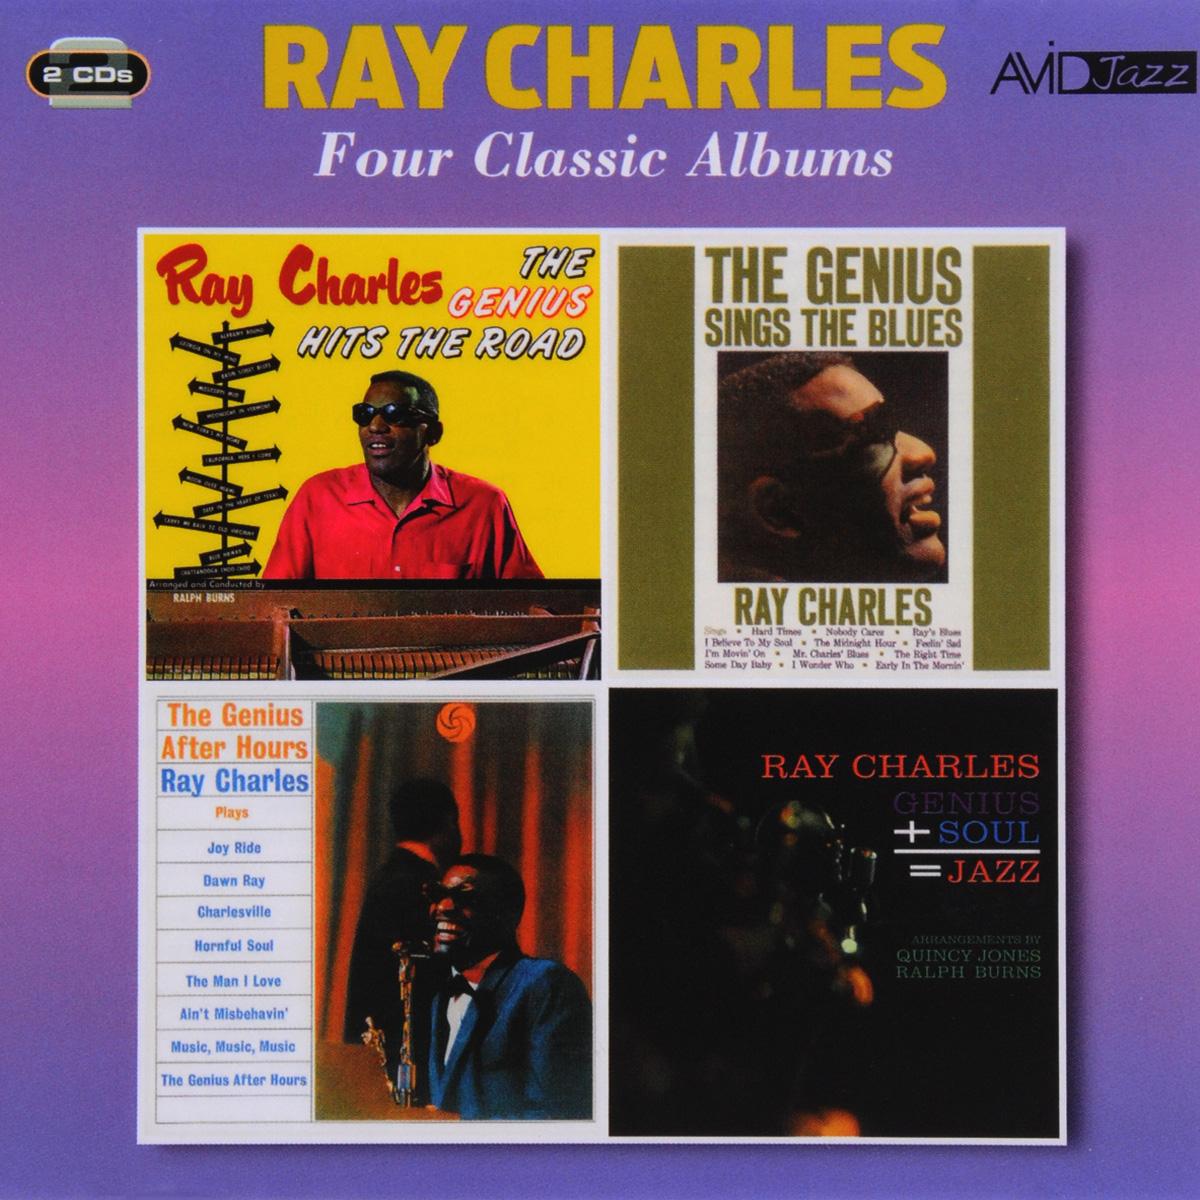 Рэй Чарльз Ray Charles. Four Classic Albums (2 CD) уинтон келли avid jazz wynton kelly four classic albums 2 cd